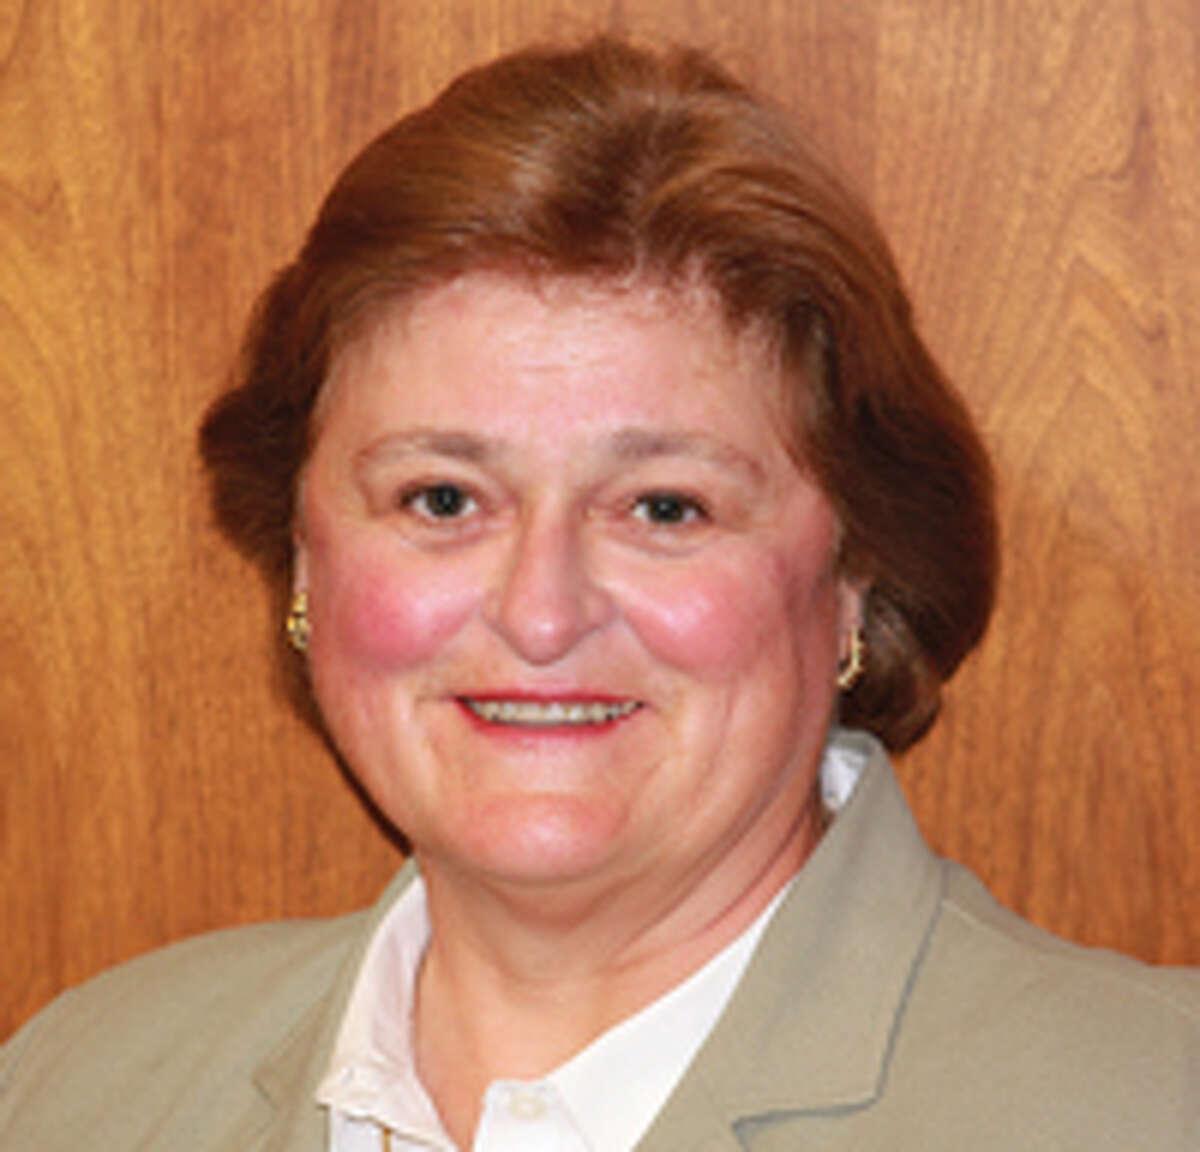 Janet C. Hall, ConnecticutâÄôs chief federal judge